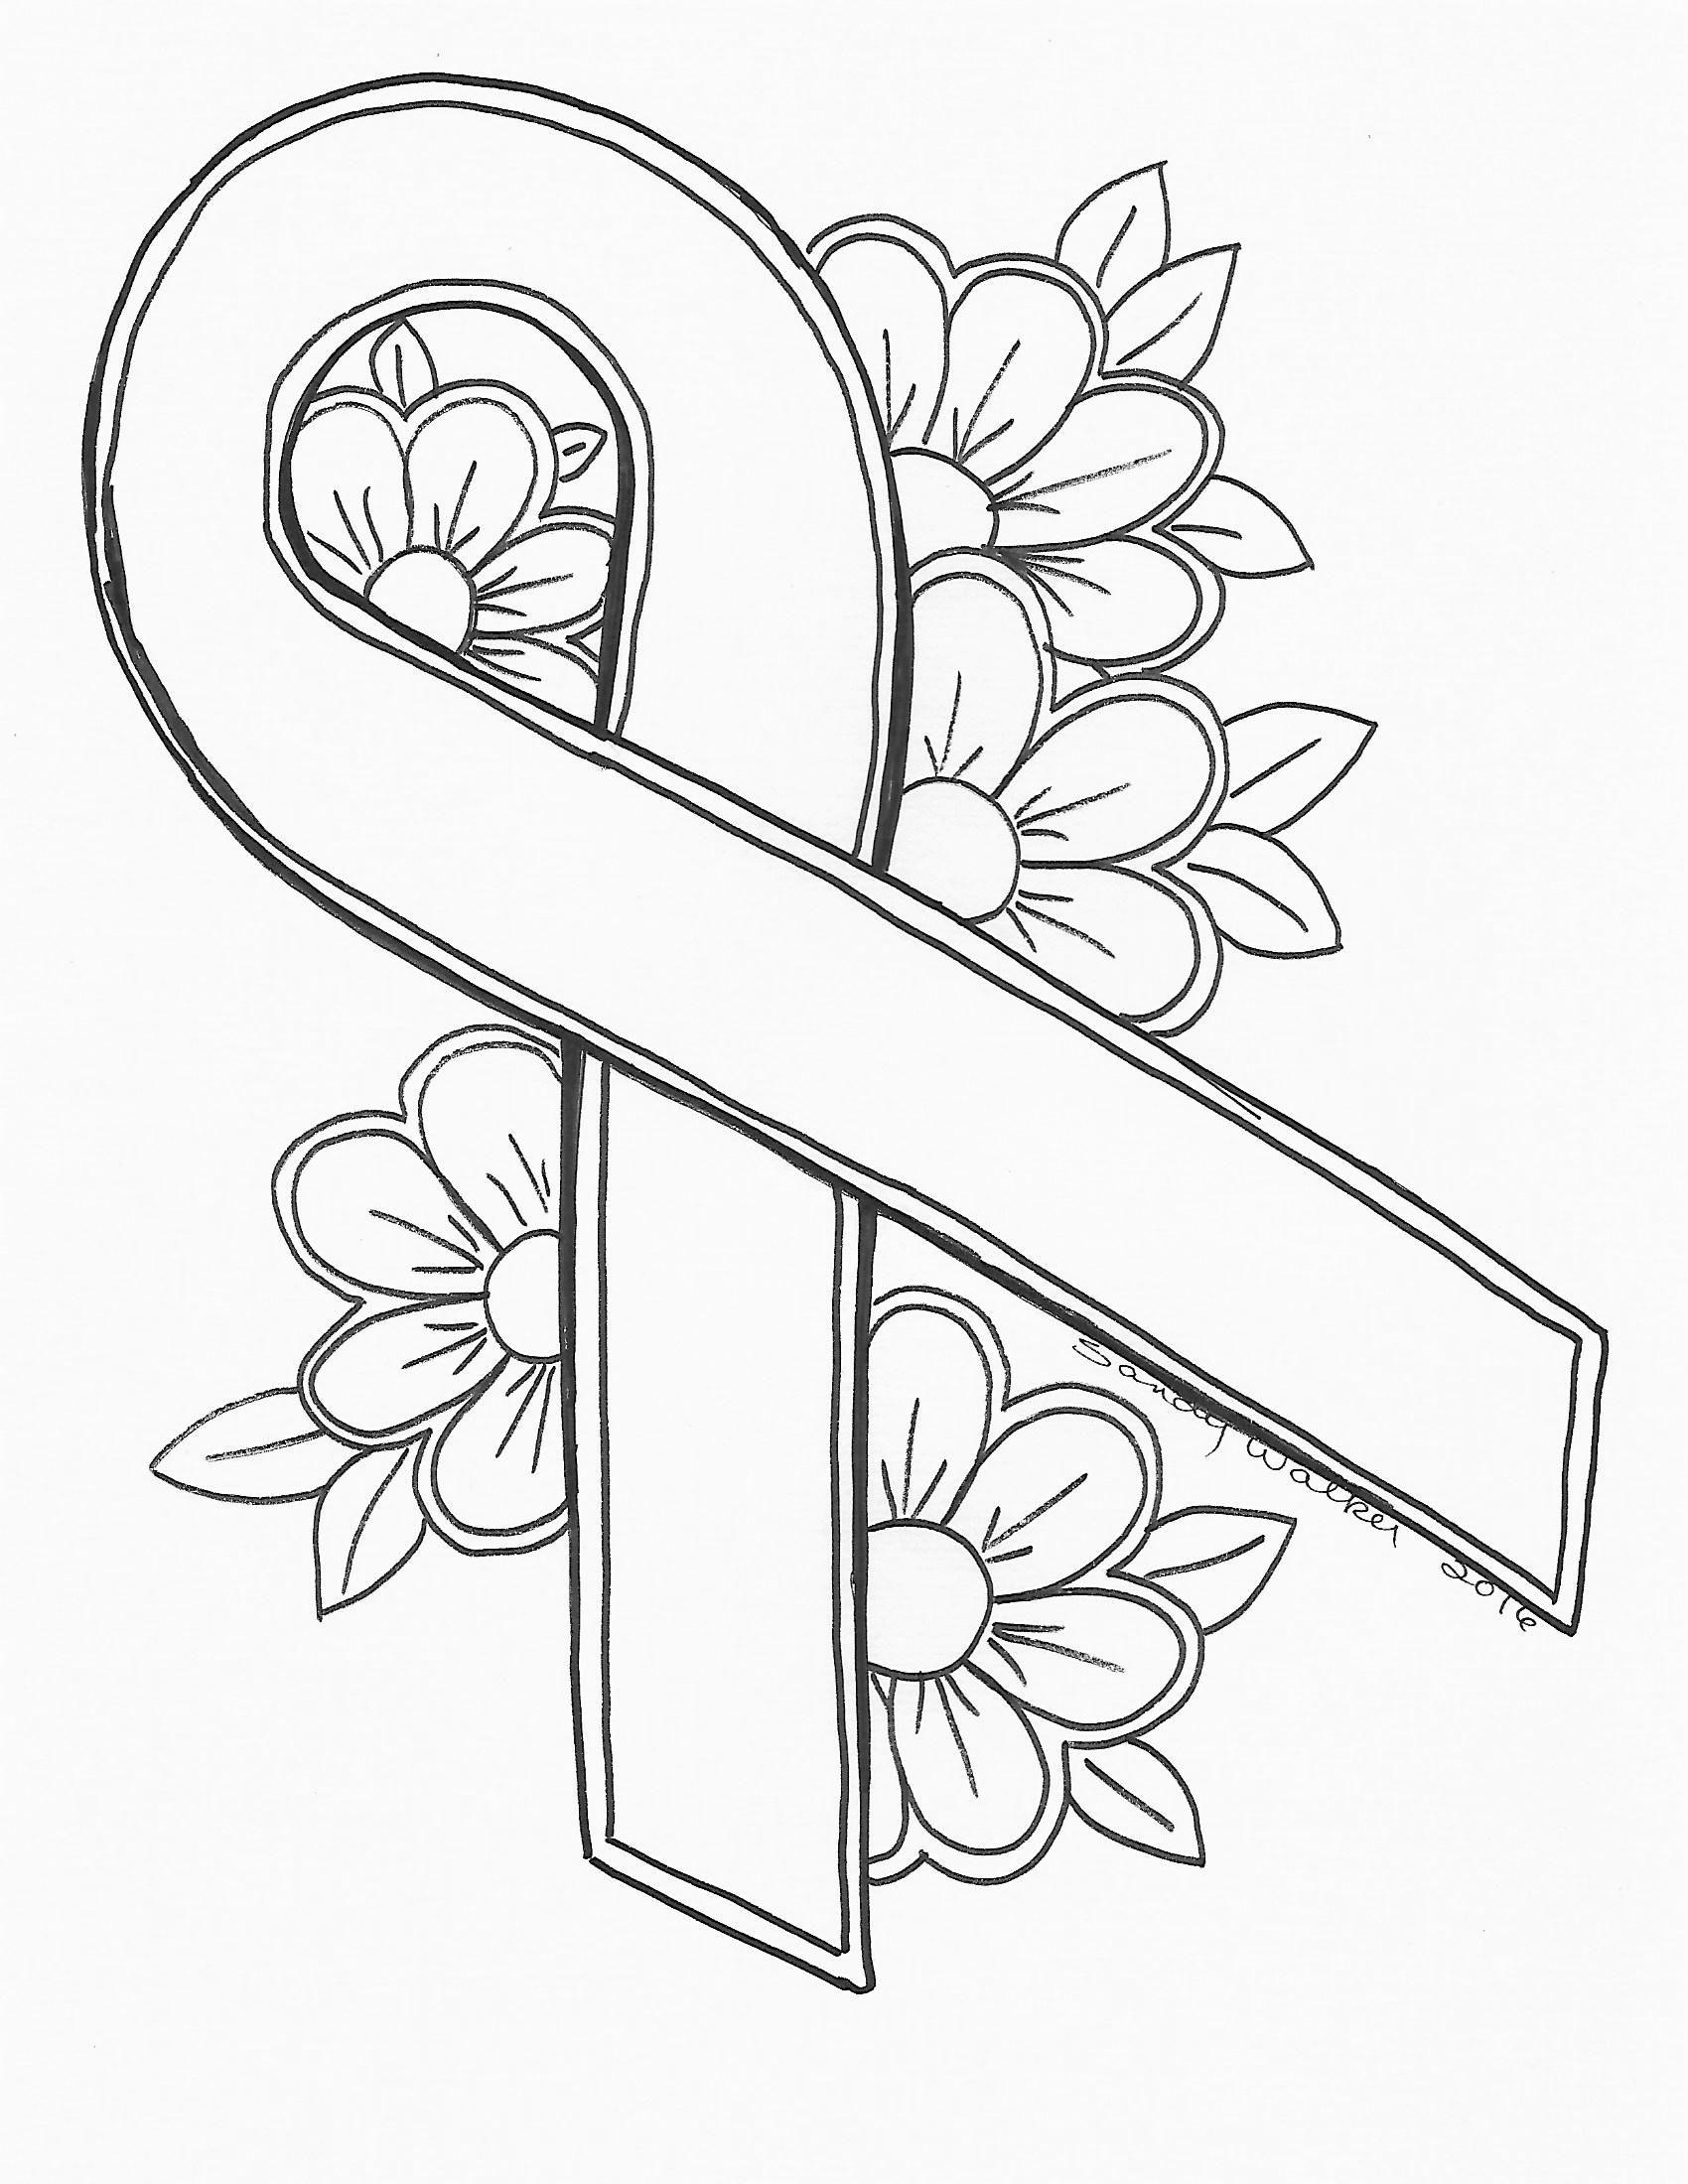 An Original by Sandra Walker 2016. Ribbon for Cancer